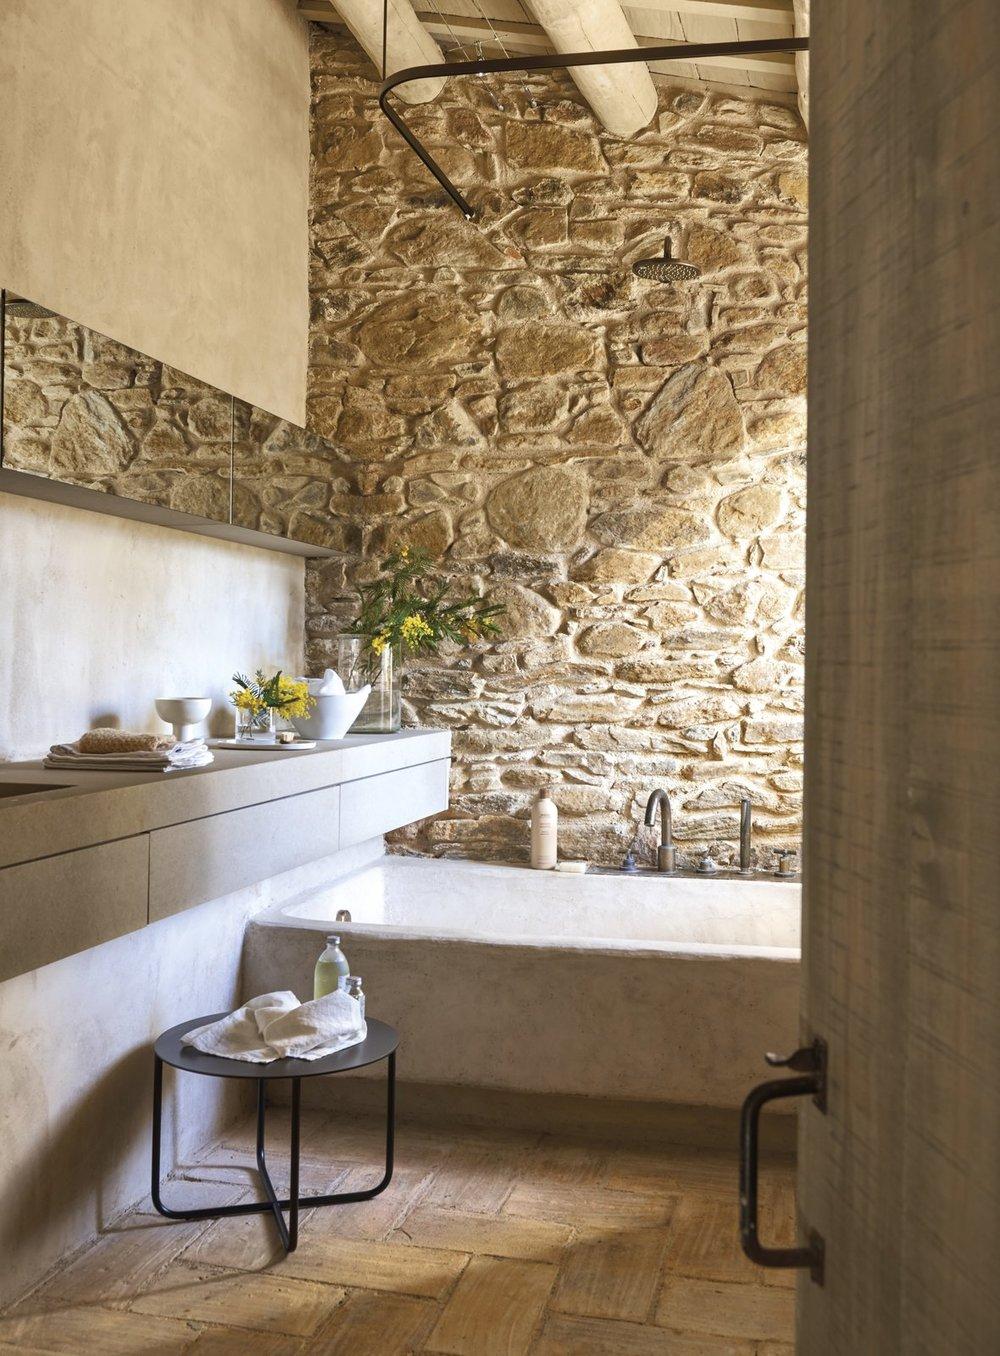 the-allstone-bathroom-furniture-collection-designed-by-joan-lao-design-studio.jpg